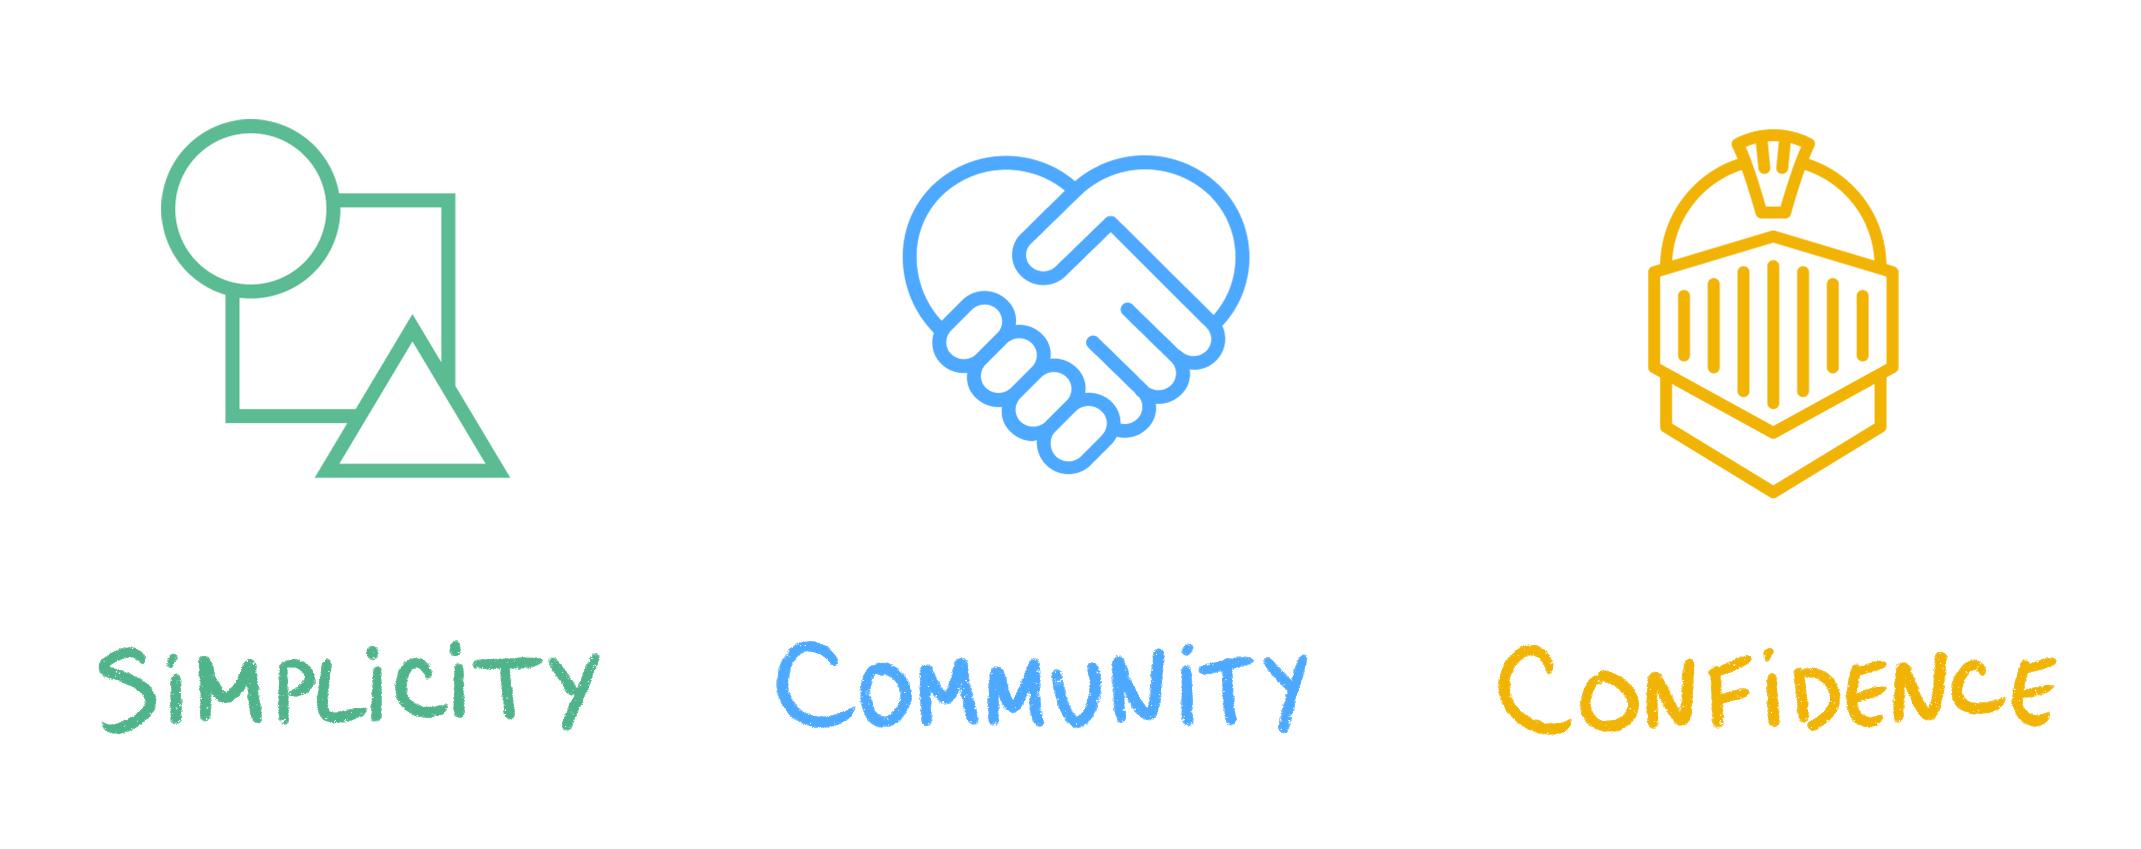 Image of design principles: simplicity, community, confidence